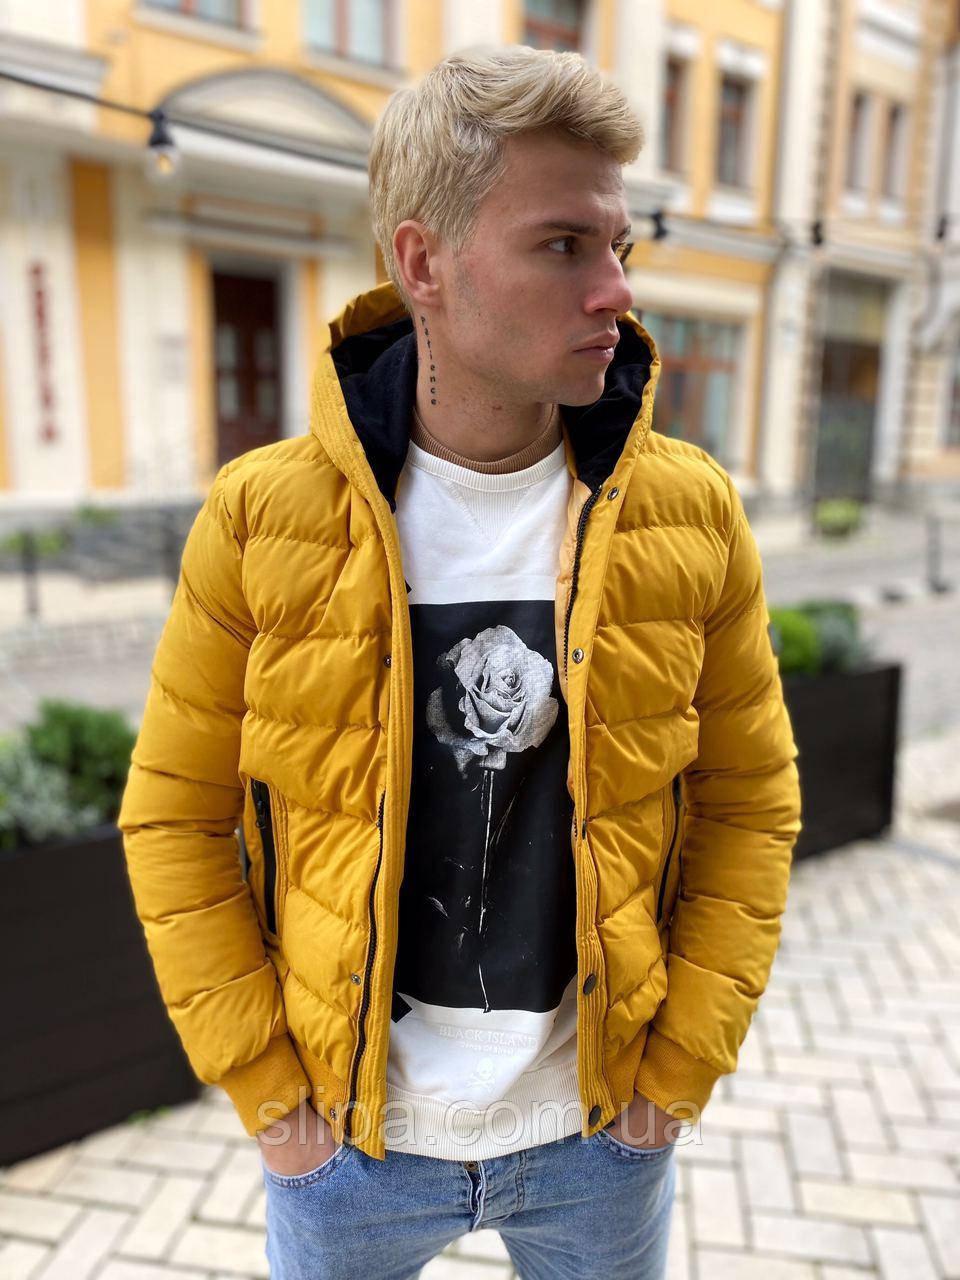 Стильная мужская куртка дутая жёлтая с капюшоном